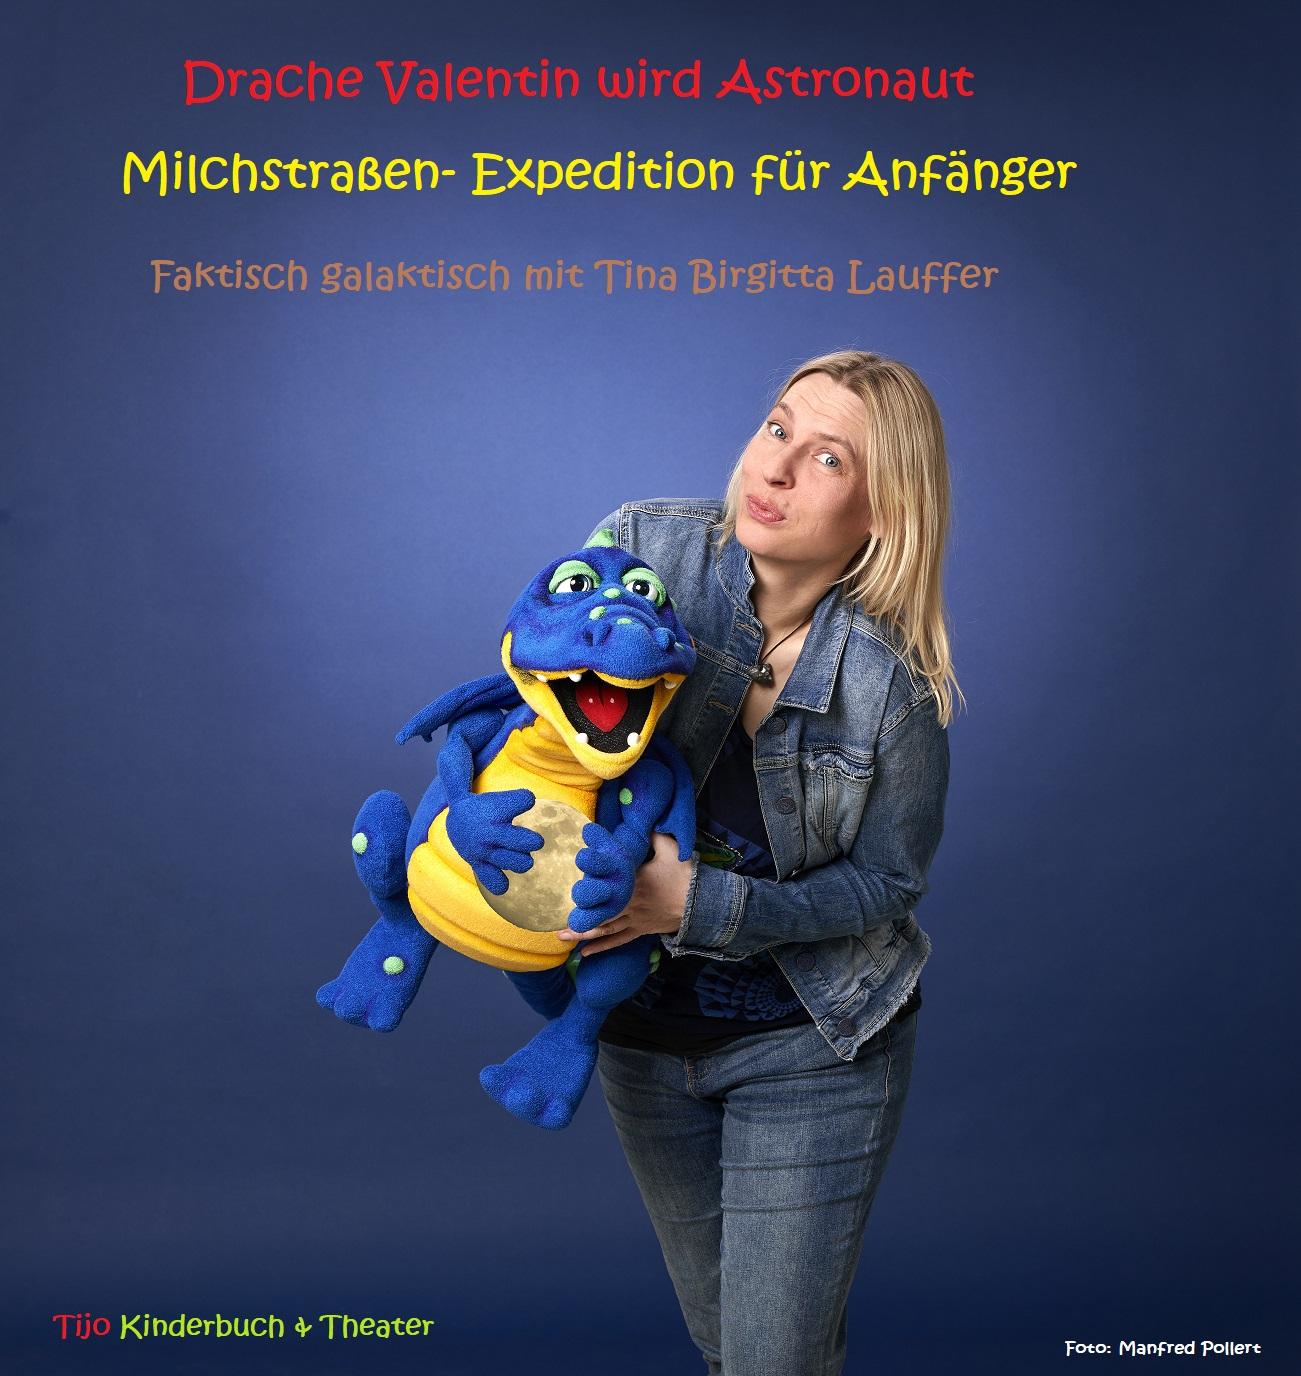 Tijo Kinderbuch - Drache Valentin wird Astronaut  - Tina Birgitta Lauffer